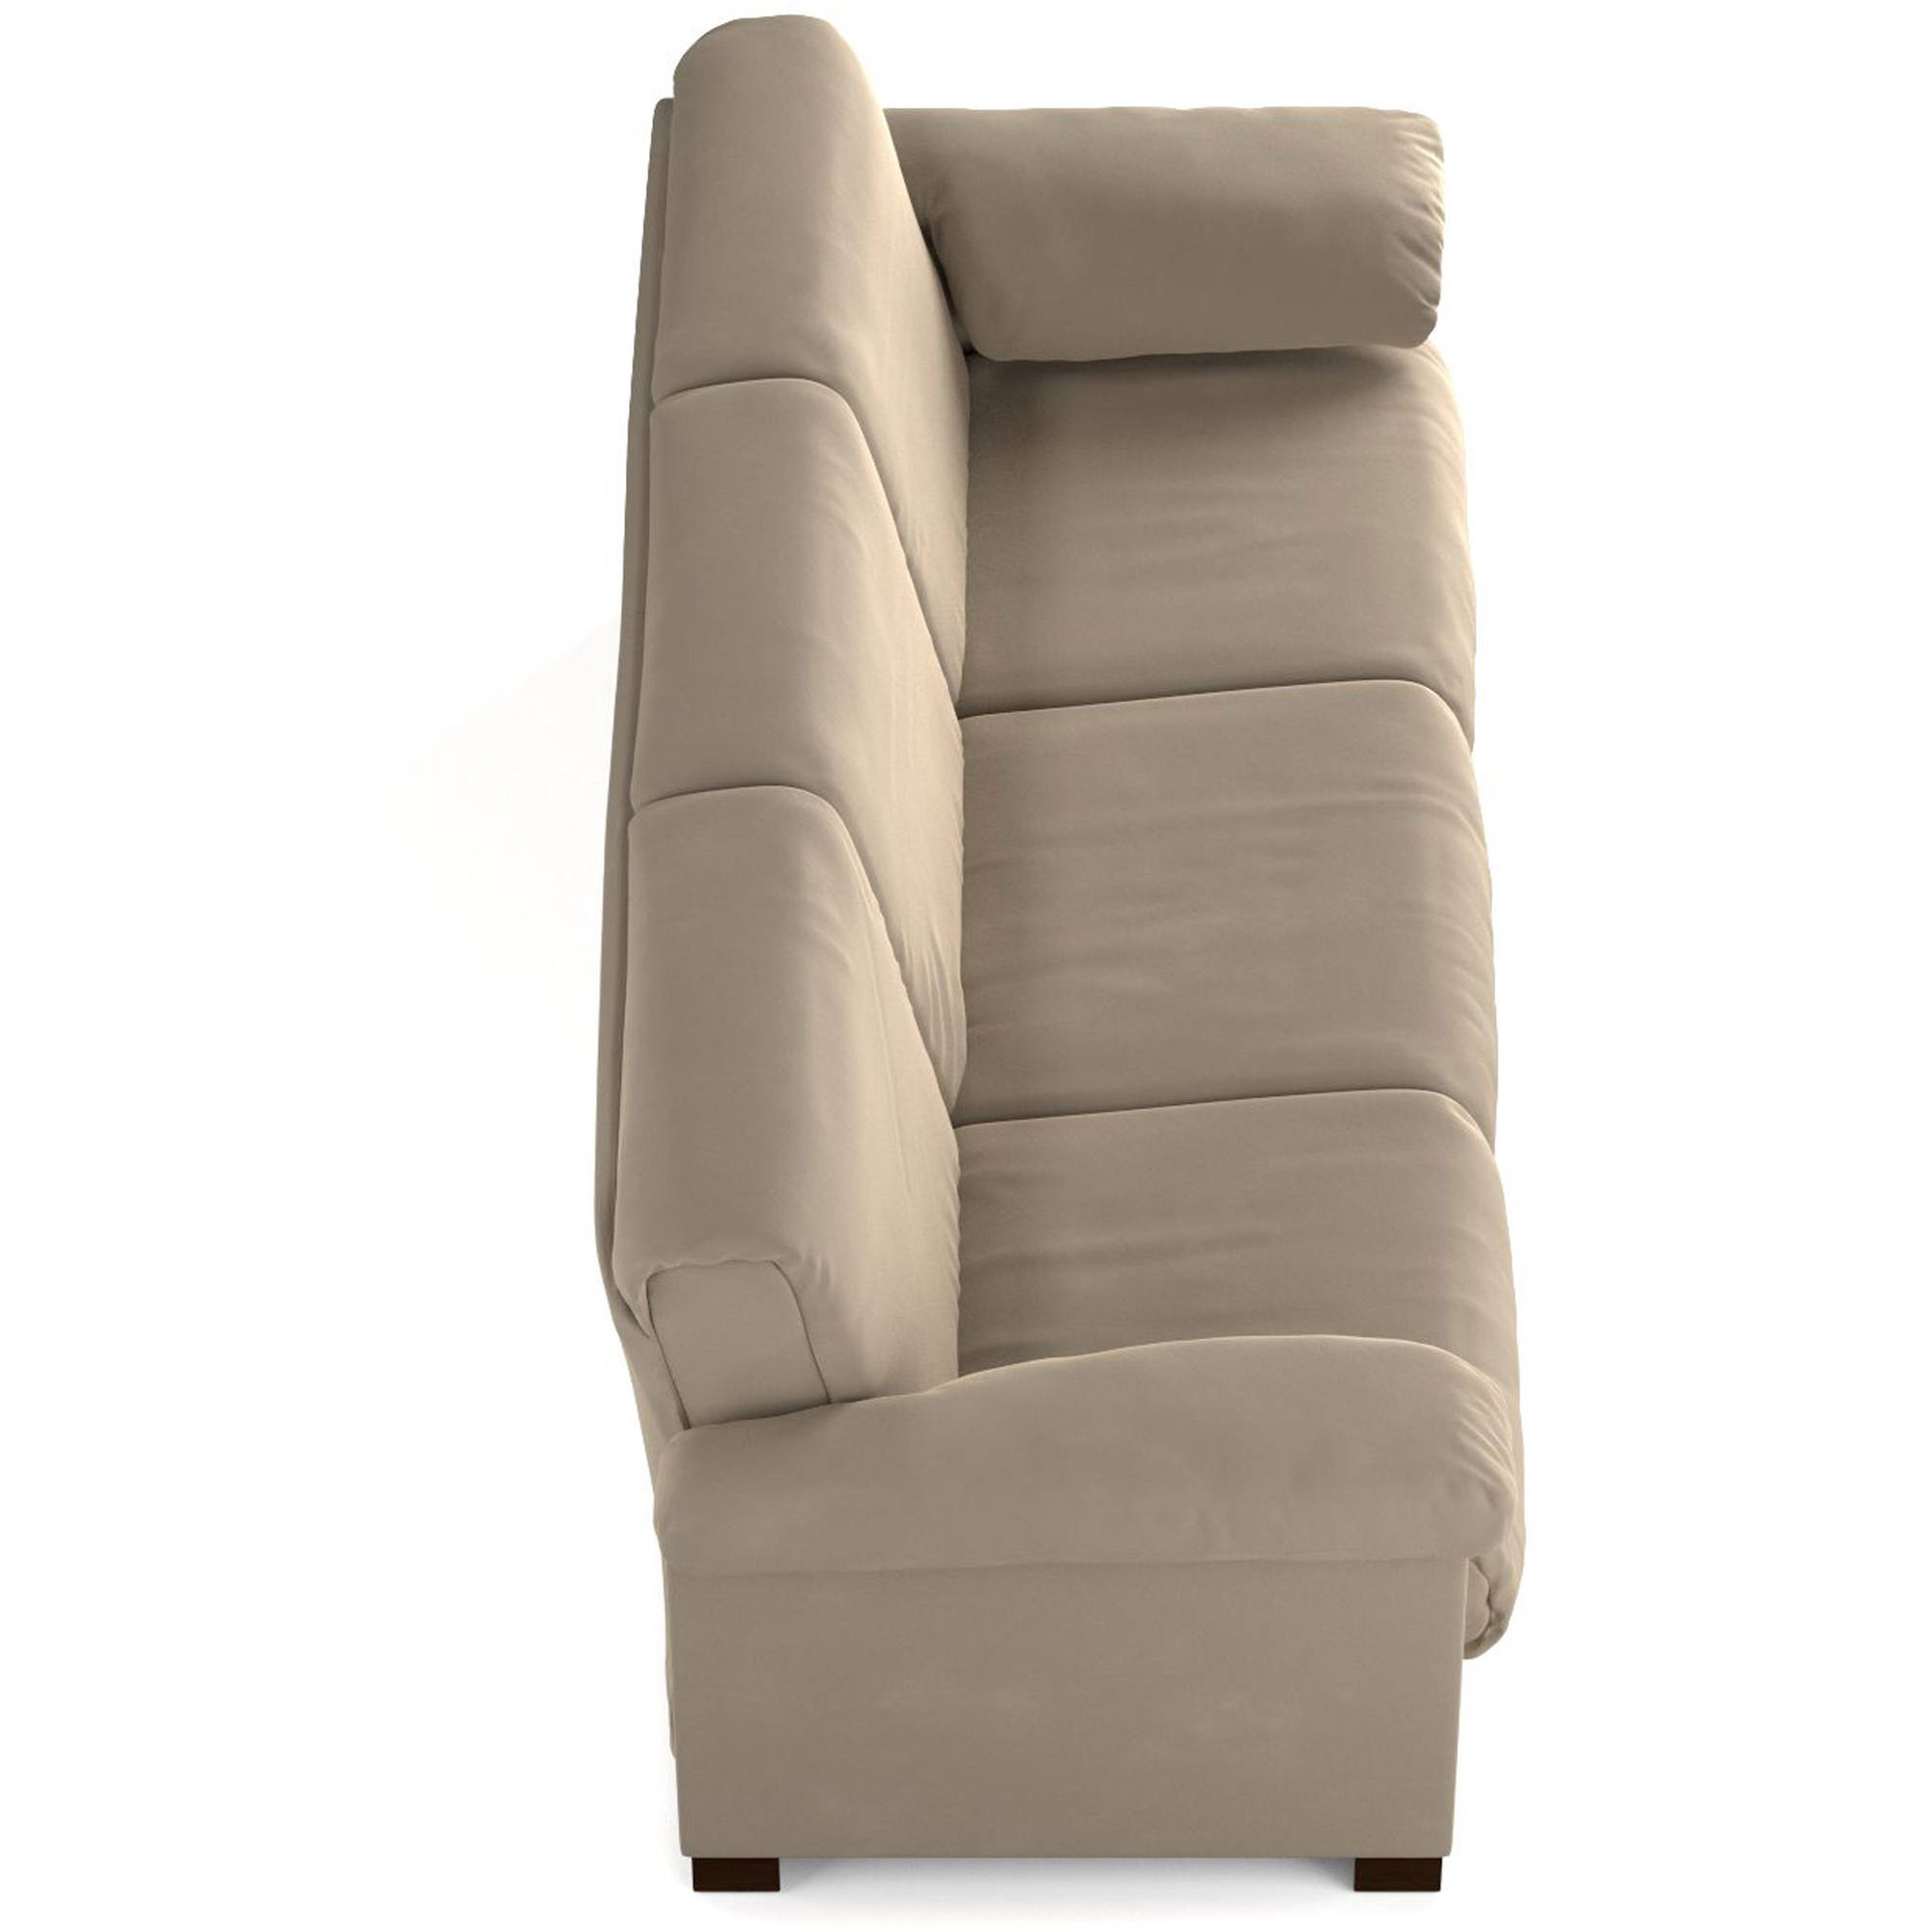 Montero Microfiber Sleeper Sofa Futon Convert A Couch Bed Multiple Colors